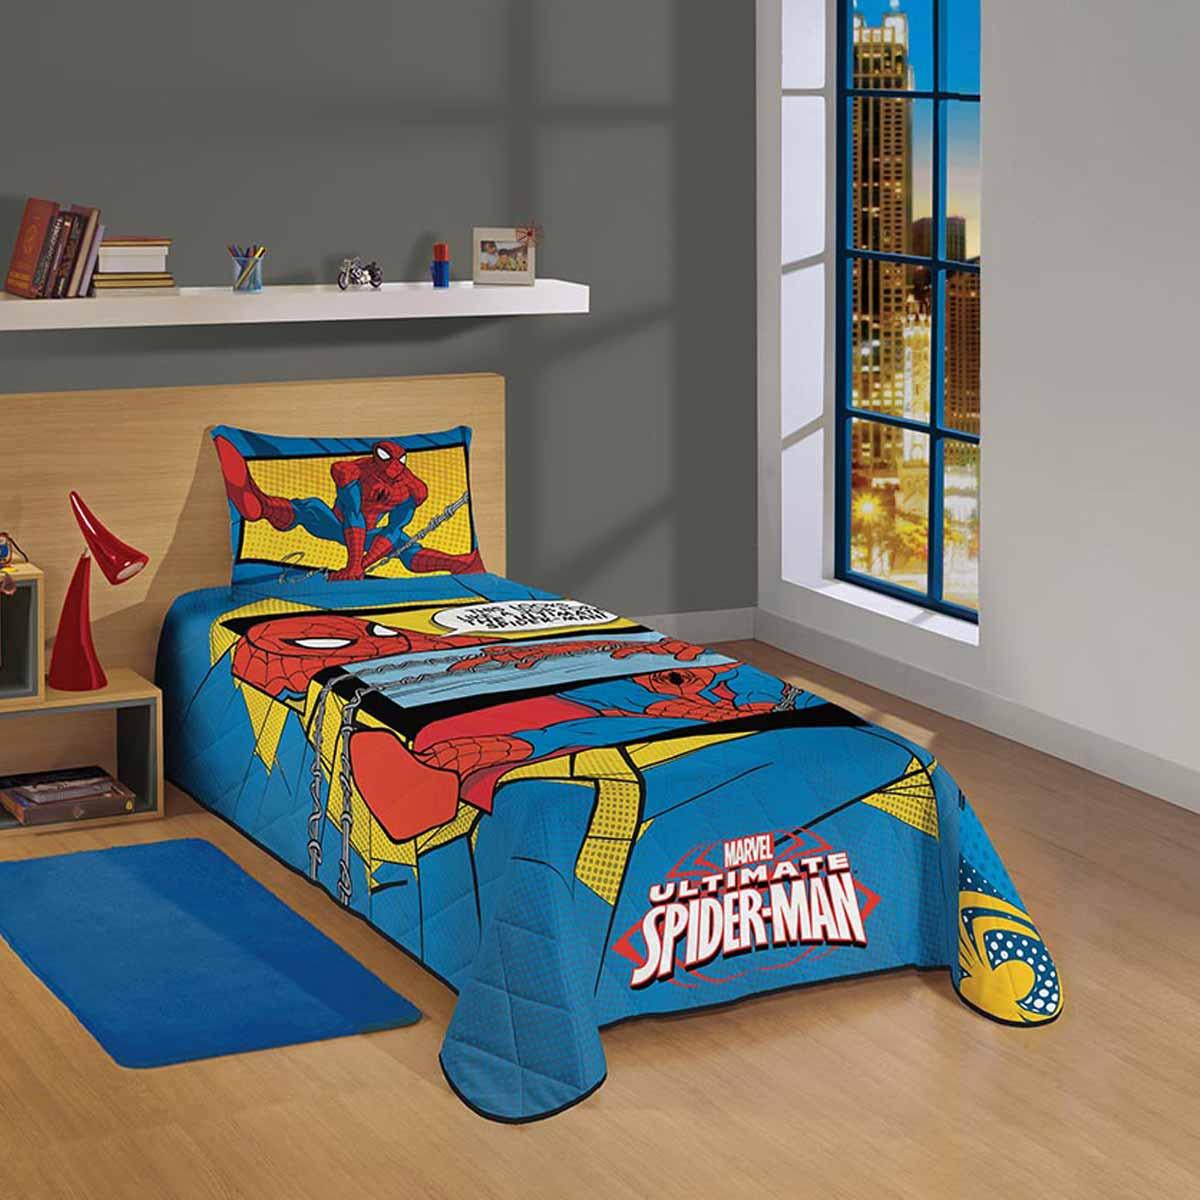 Colcha Matelassê Spider Man Ultimate 1,50Mx2,10M 1 Peça Lepper